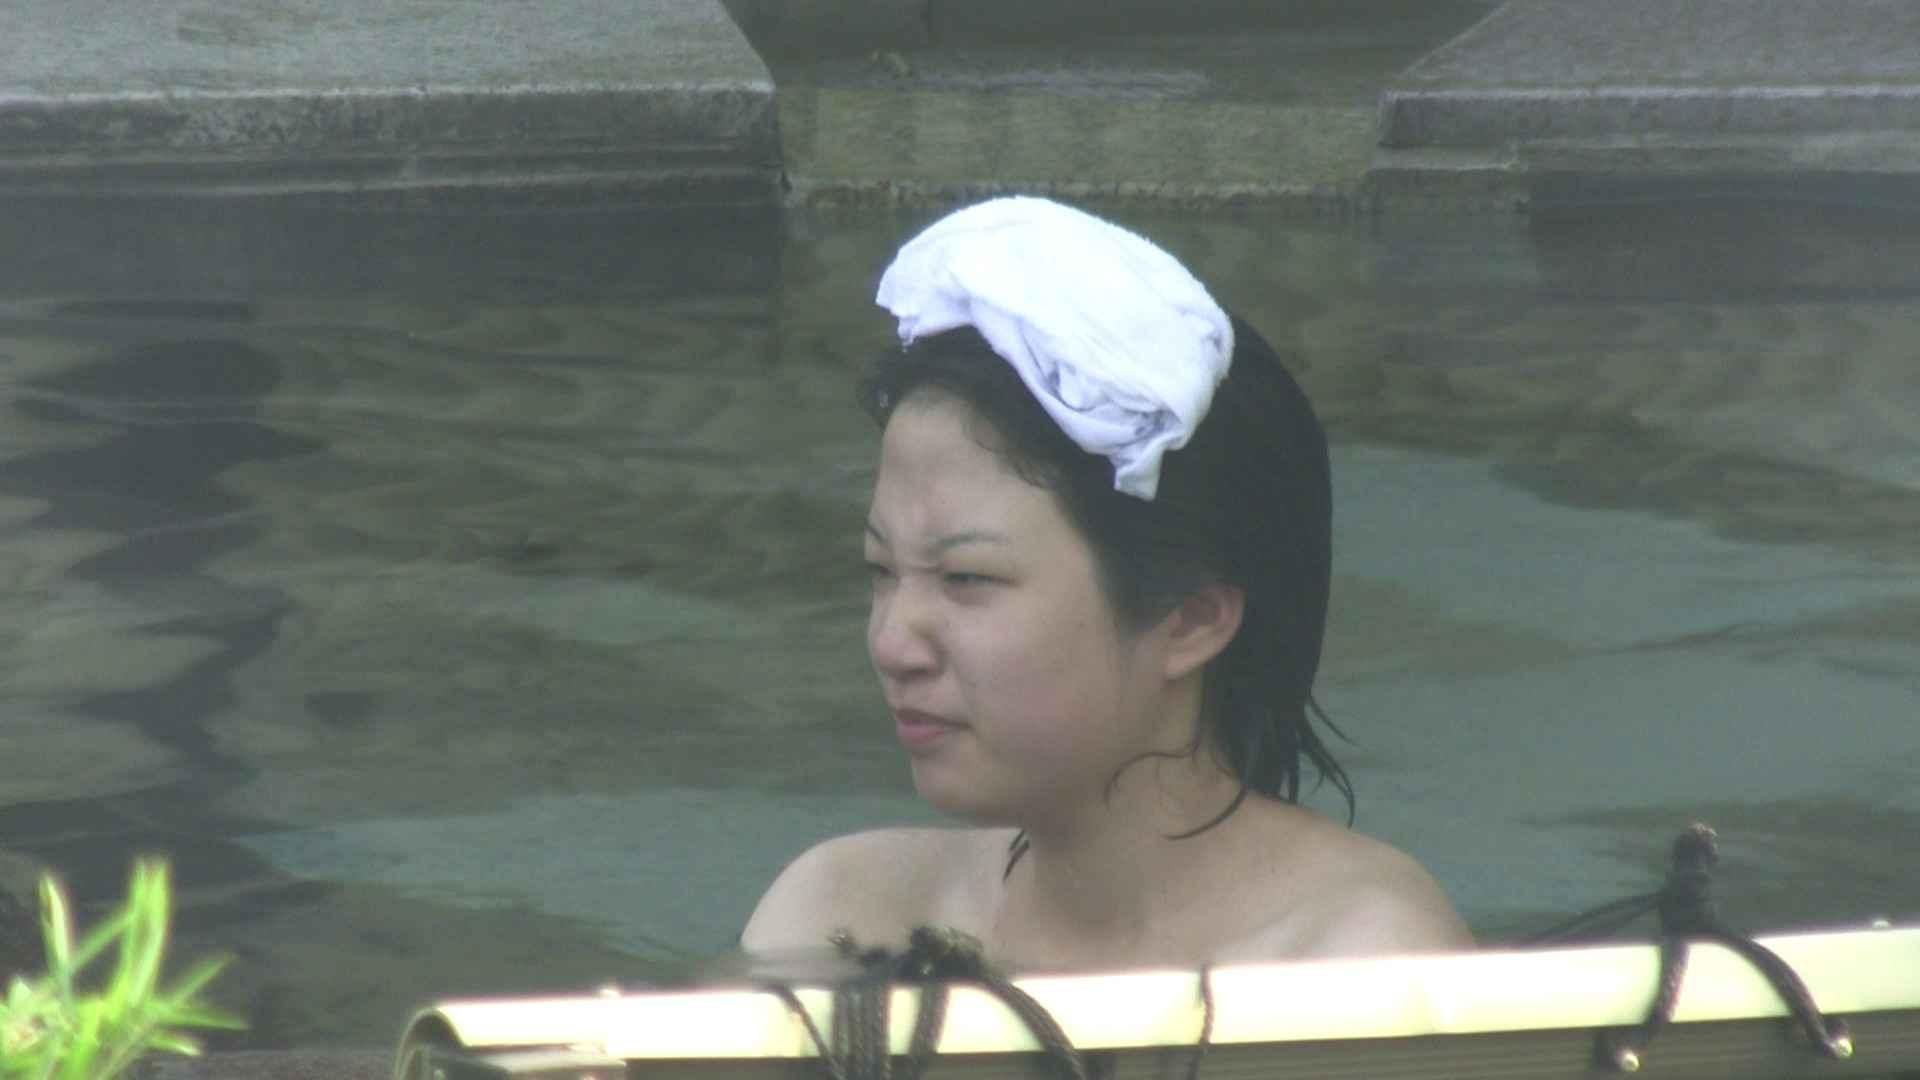 Aquaな露天風呂Vol.172 盗撮映像  113Pix 41